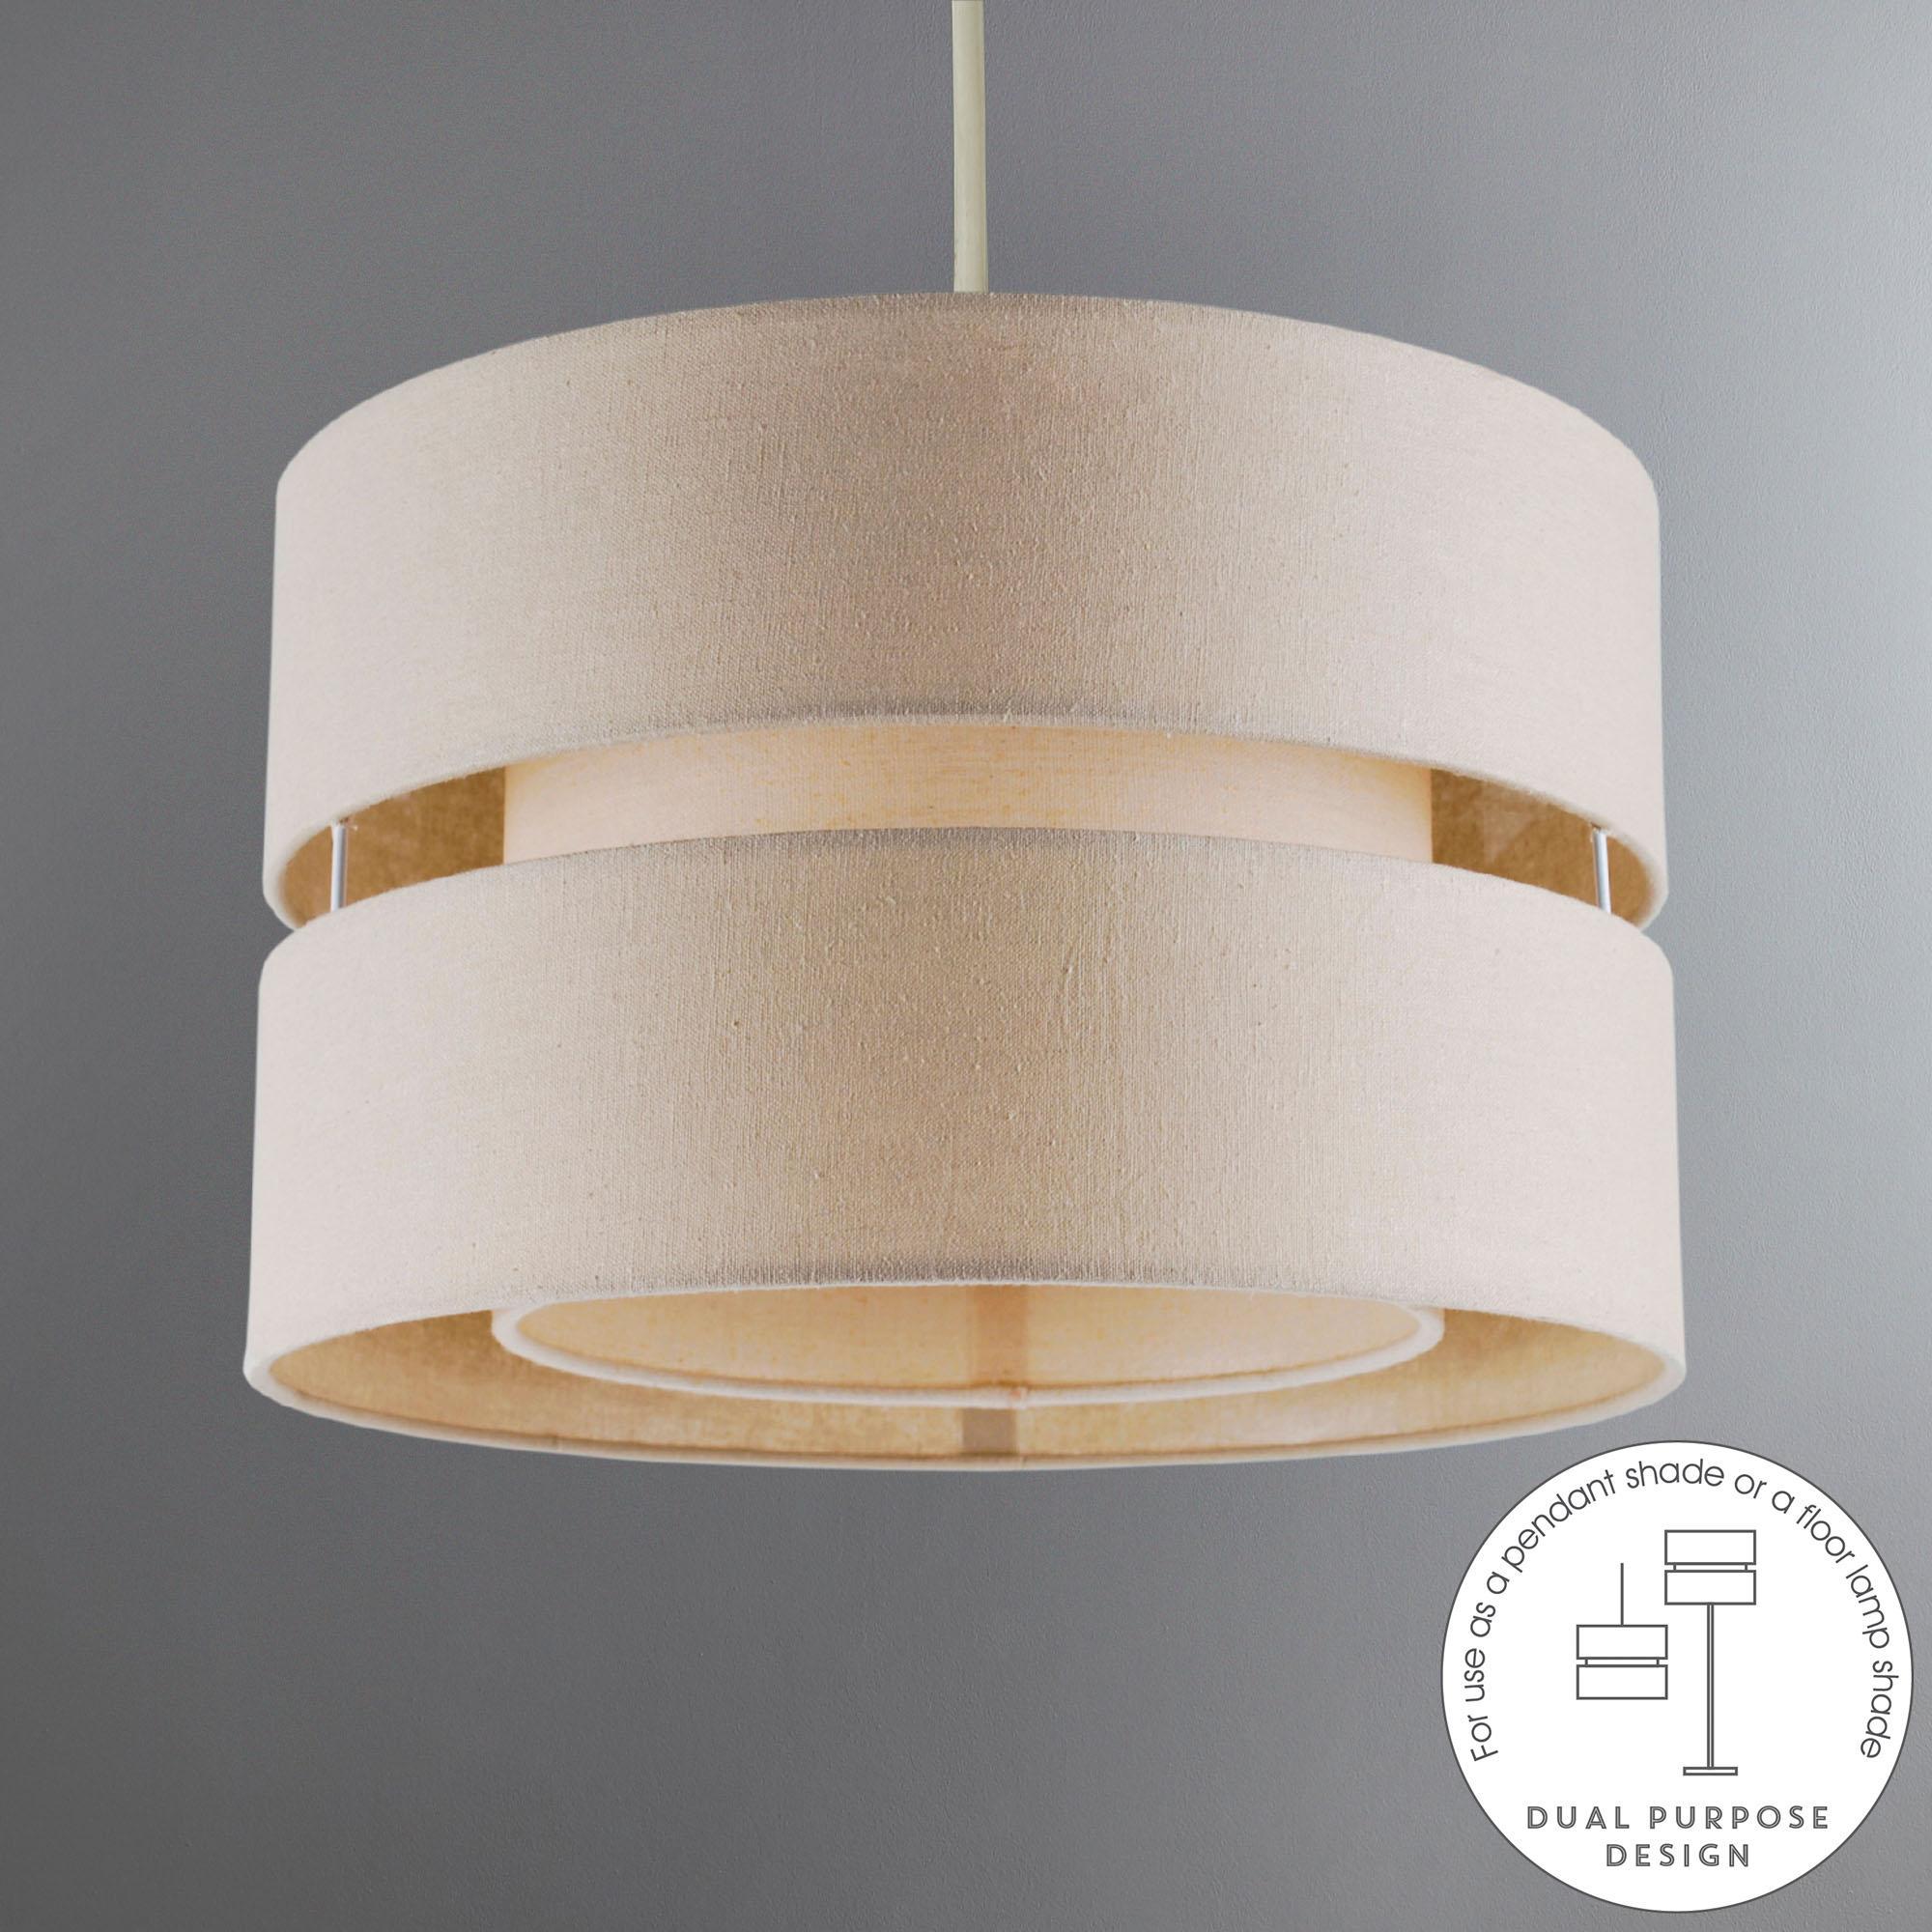 light shades frea large pendant lampshade ORHMPDD